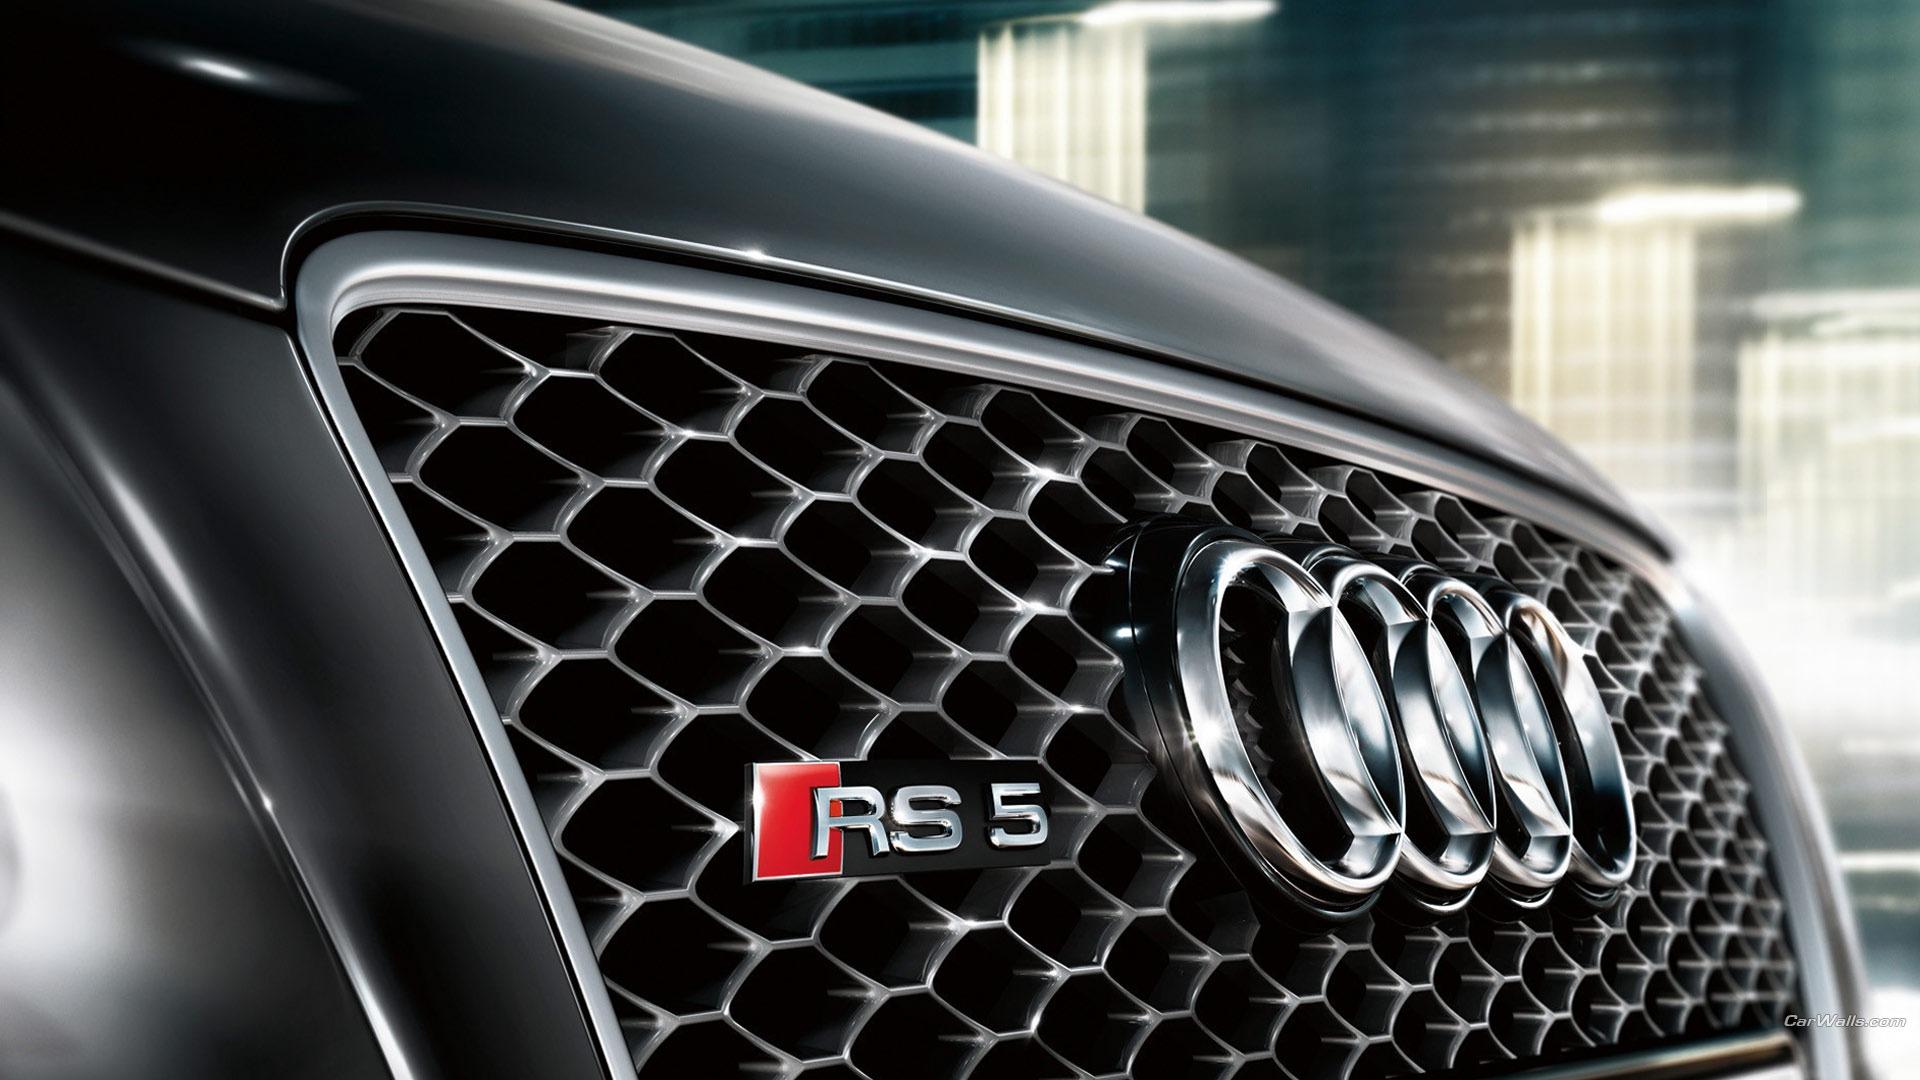 Audi Rs Desktop Wallpaper X